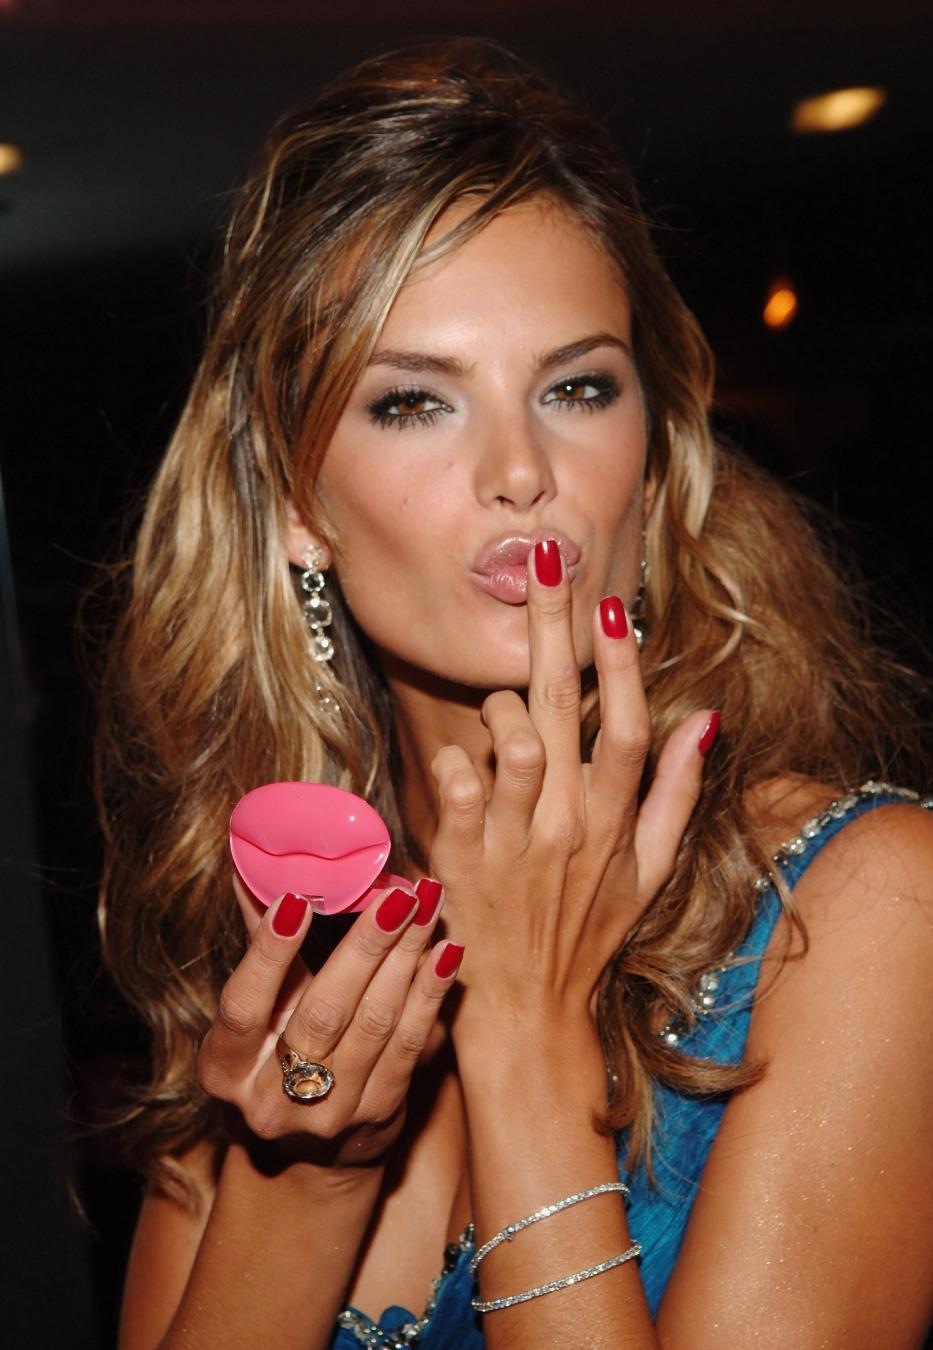 Alessandra Ambrosio photo gallery - high quality pics of ... Kim Kardashian Makeup